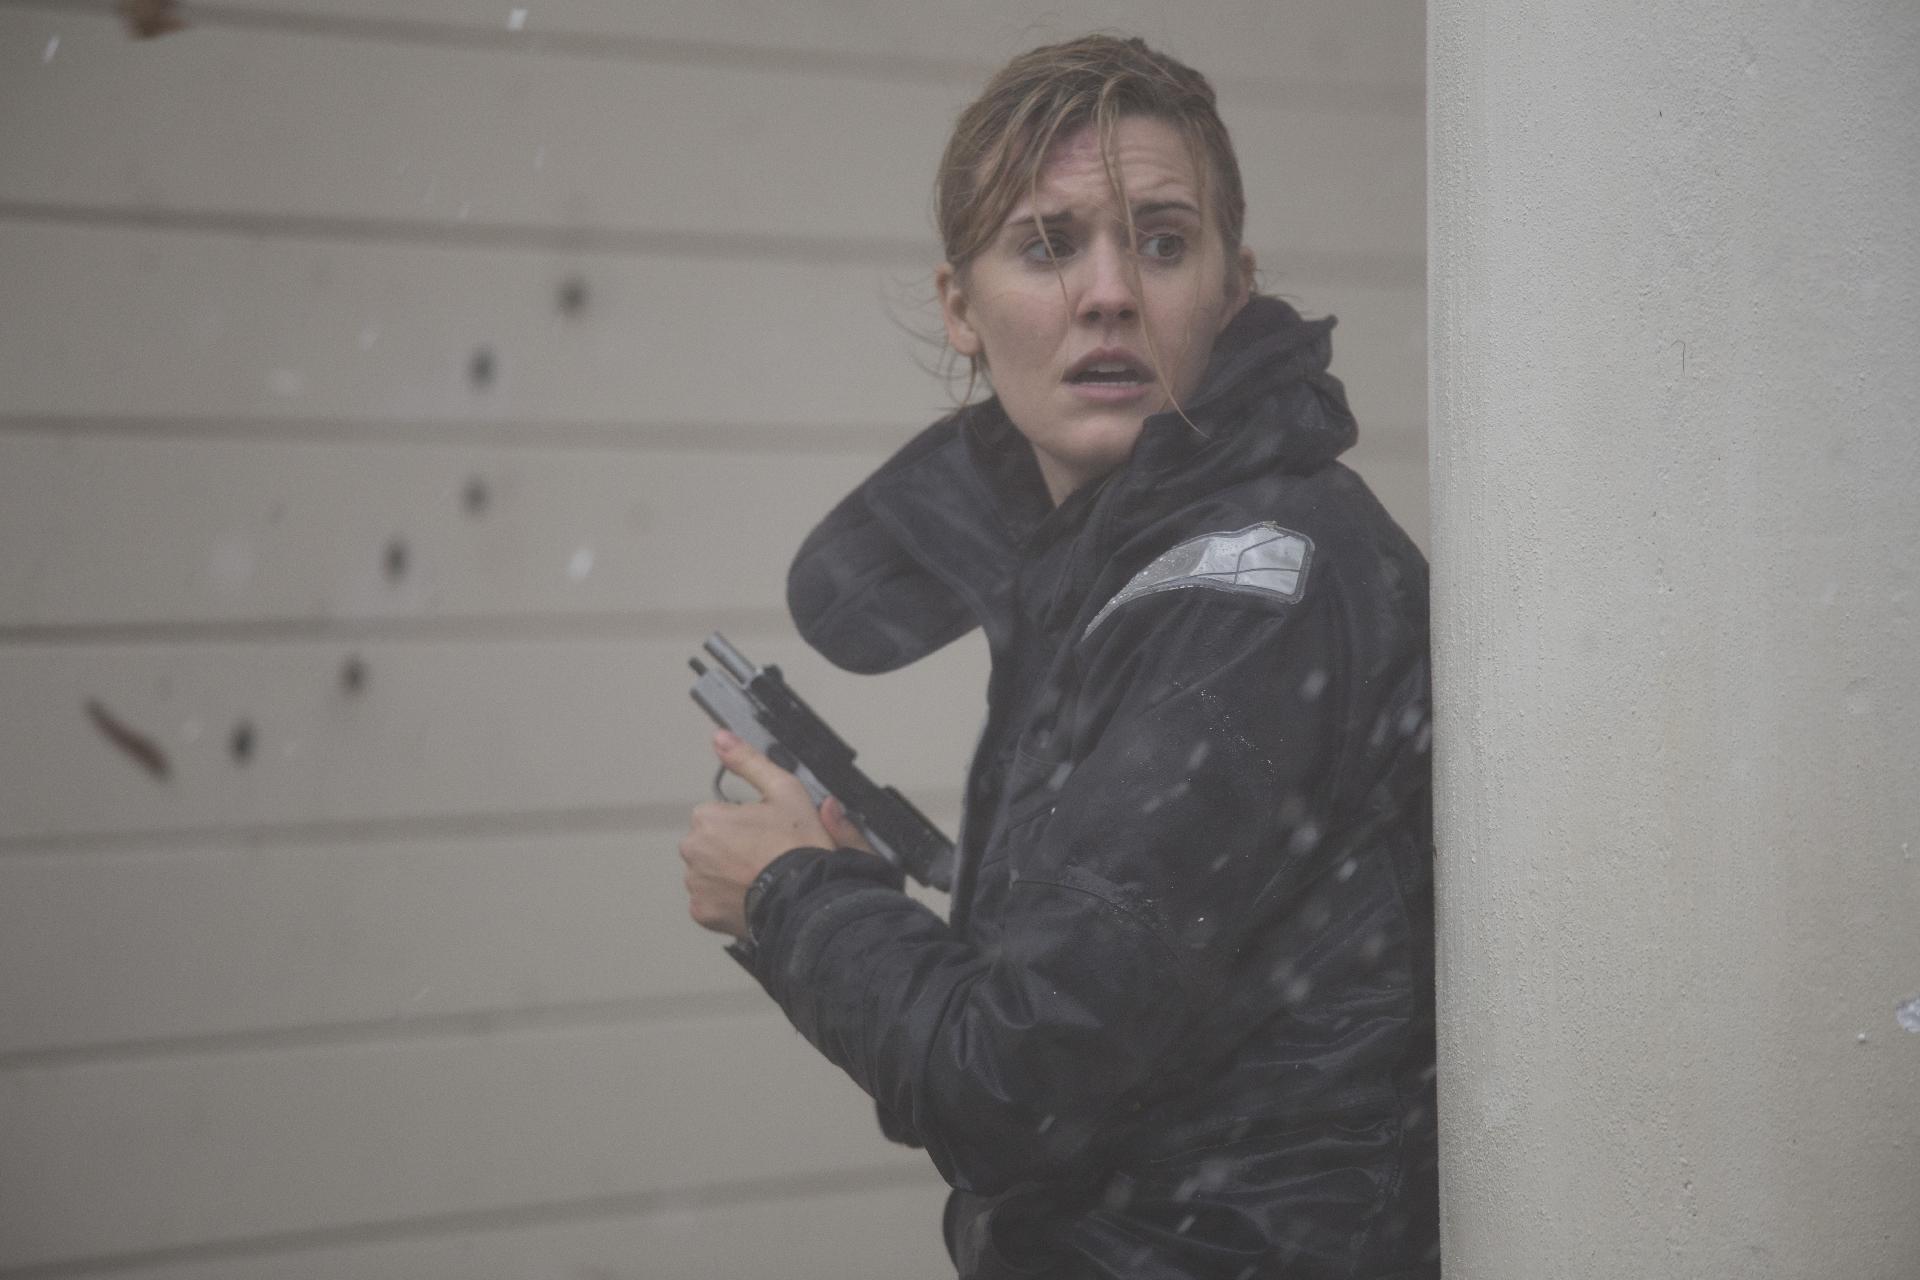 Maggie Grace in The Hurricane Heist (2018)